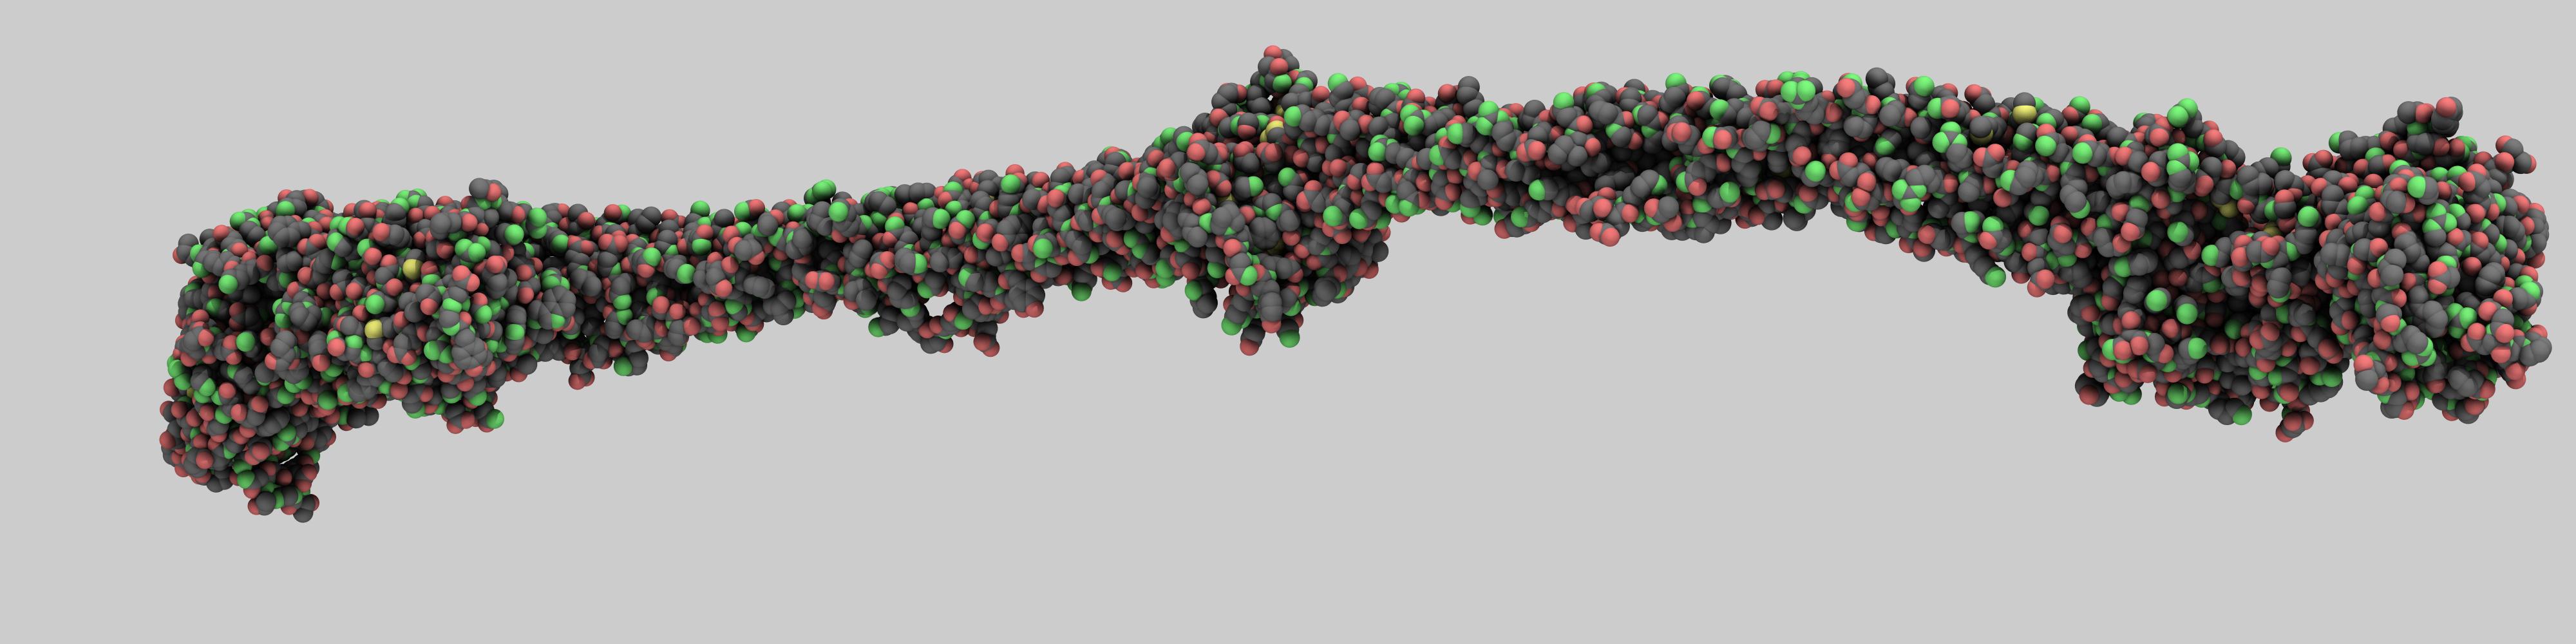 iMiJ.pdb: Native Chicken Fibrinogen rendered using broad illumination on the BASS (NIH 1S10RR023069-01)